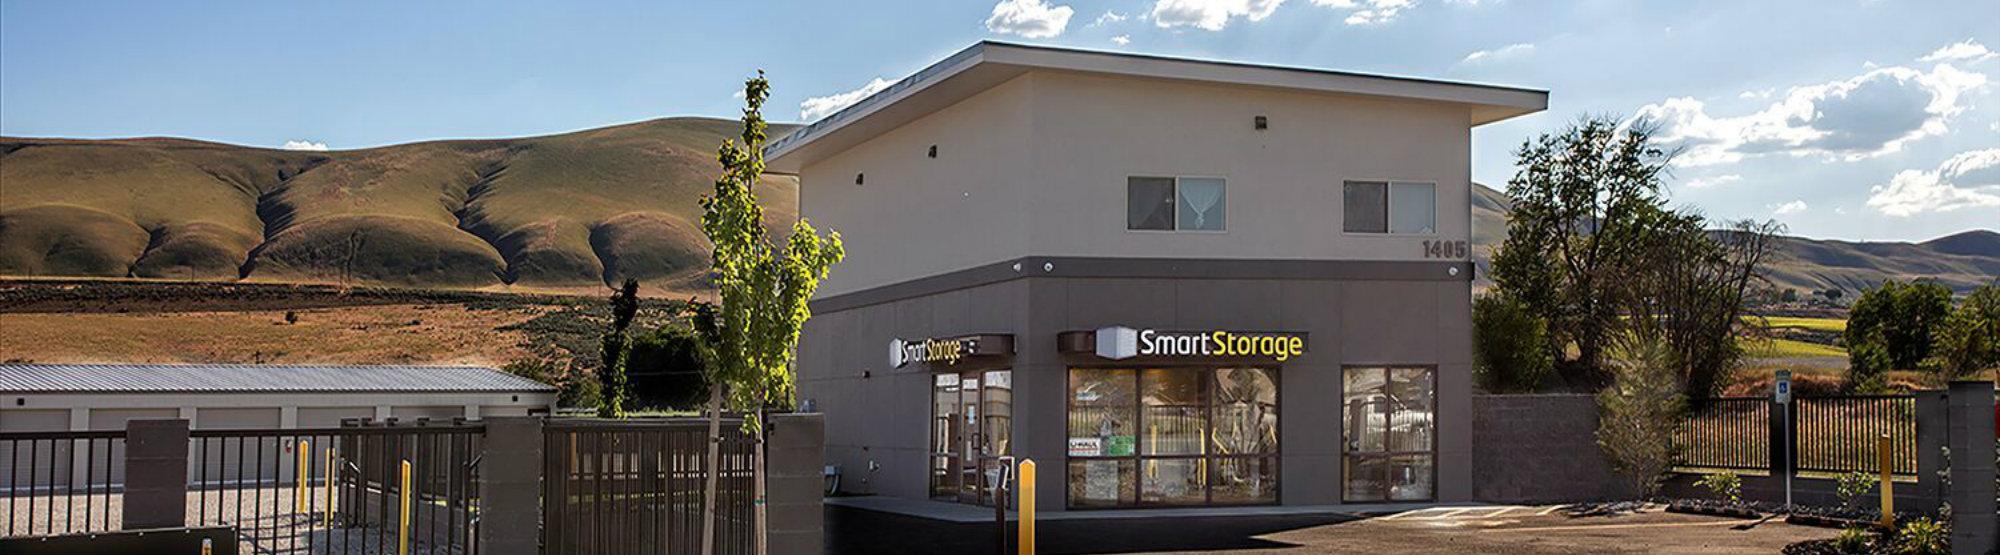 Drive Up Storage in Belton City, WA